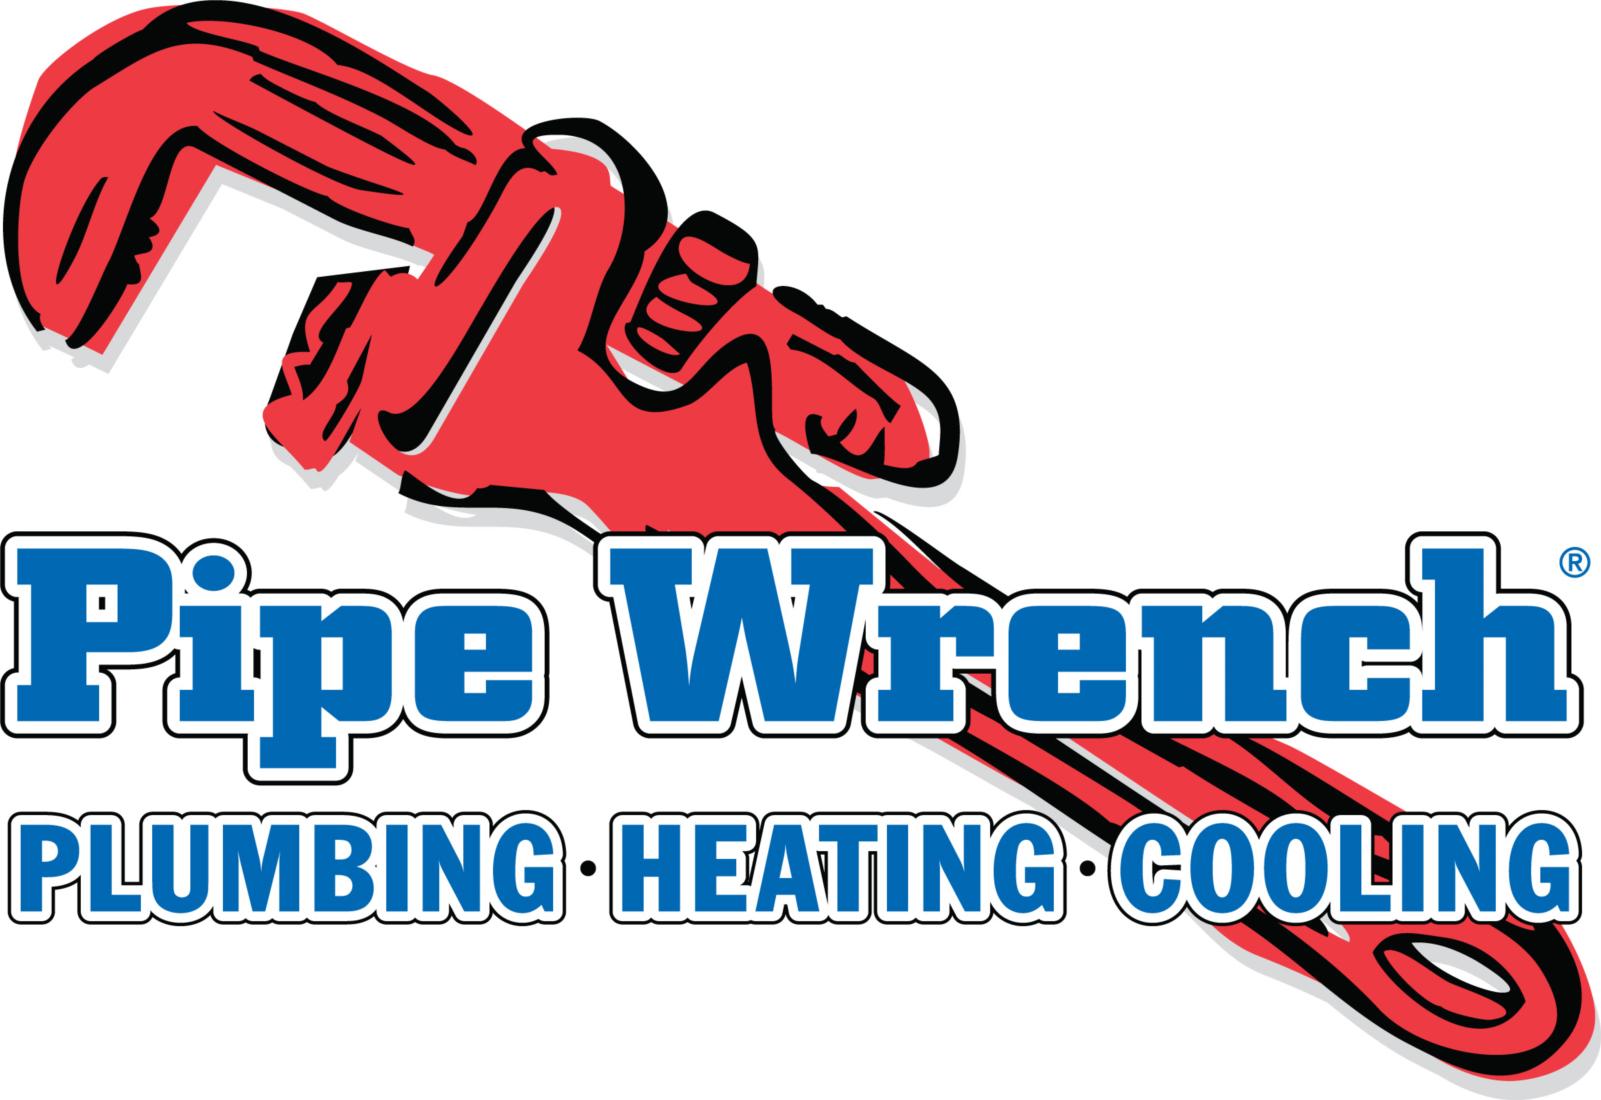 Pipe Wrench Plumbing, Heating & Cooling, Inc. logo